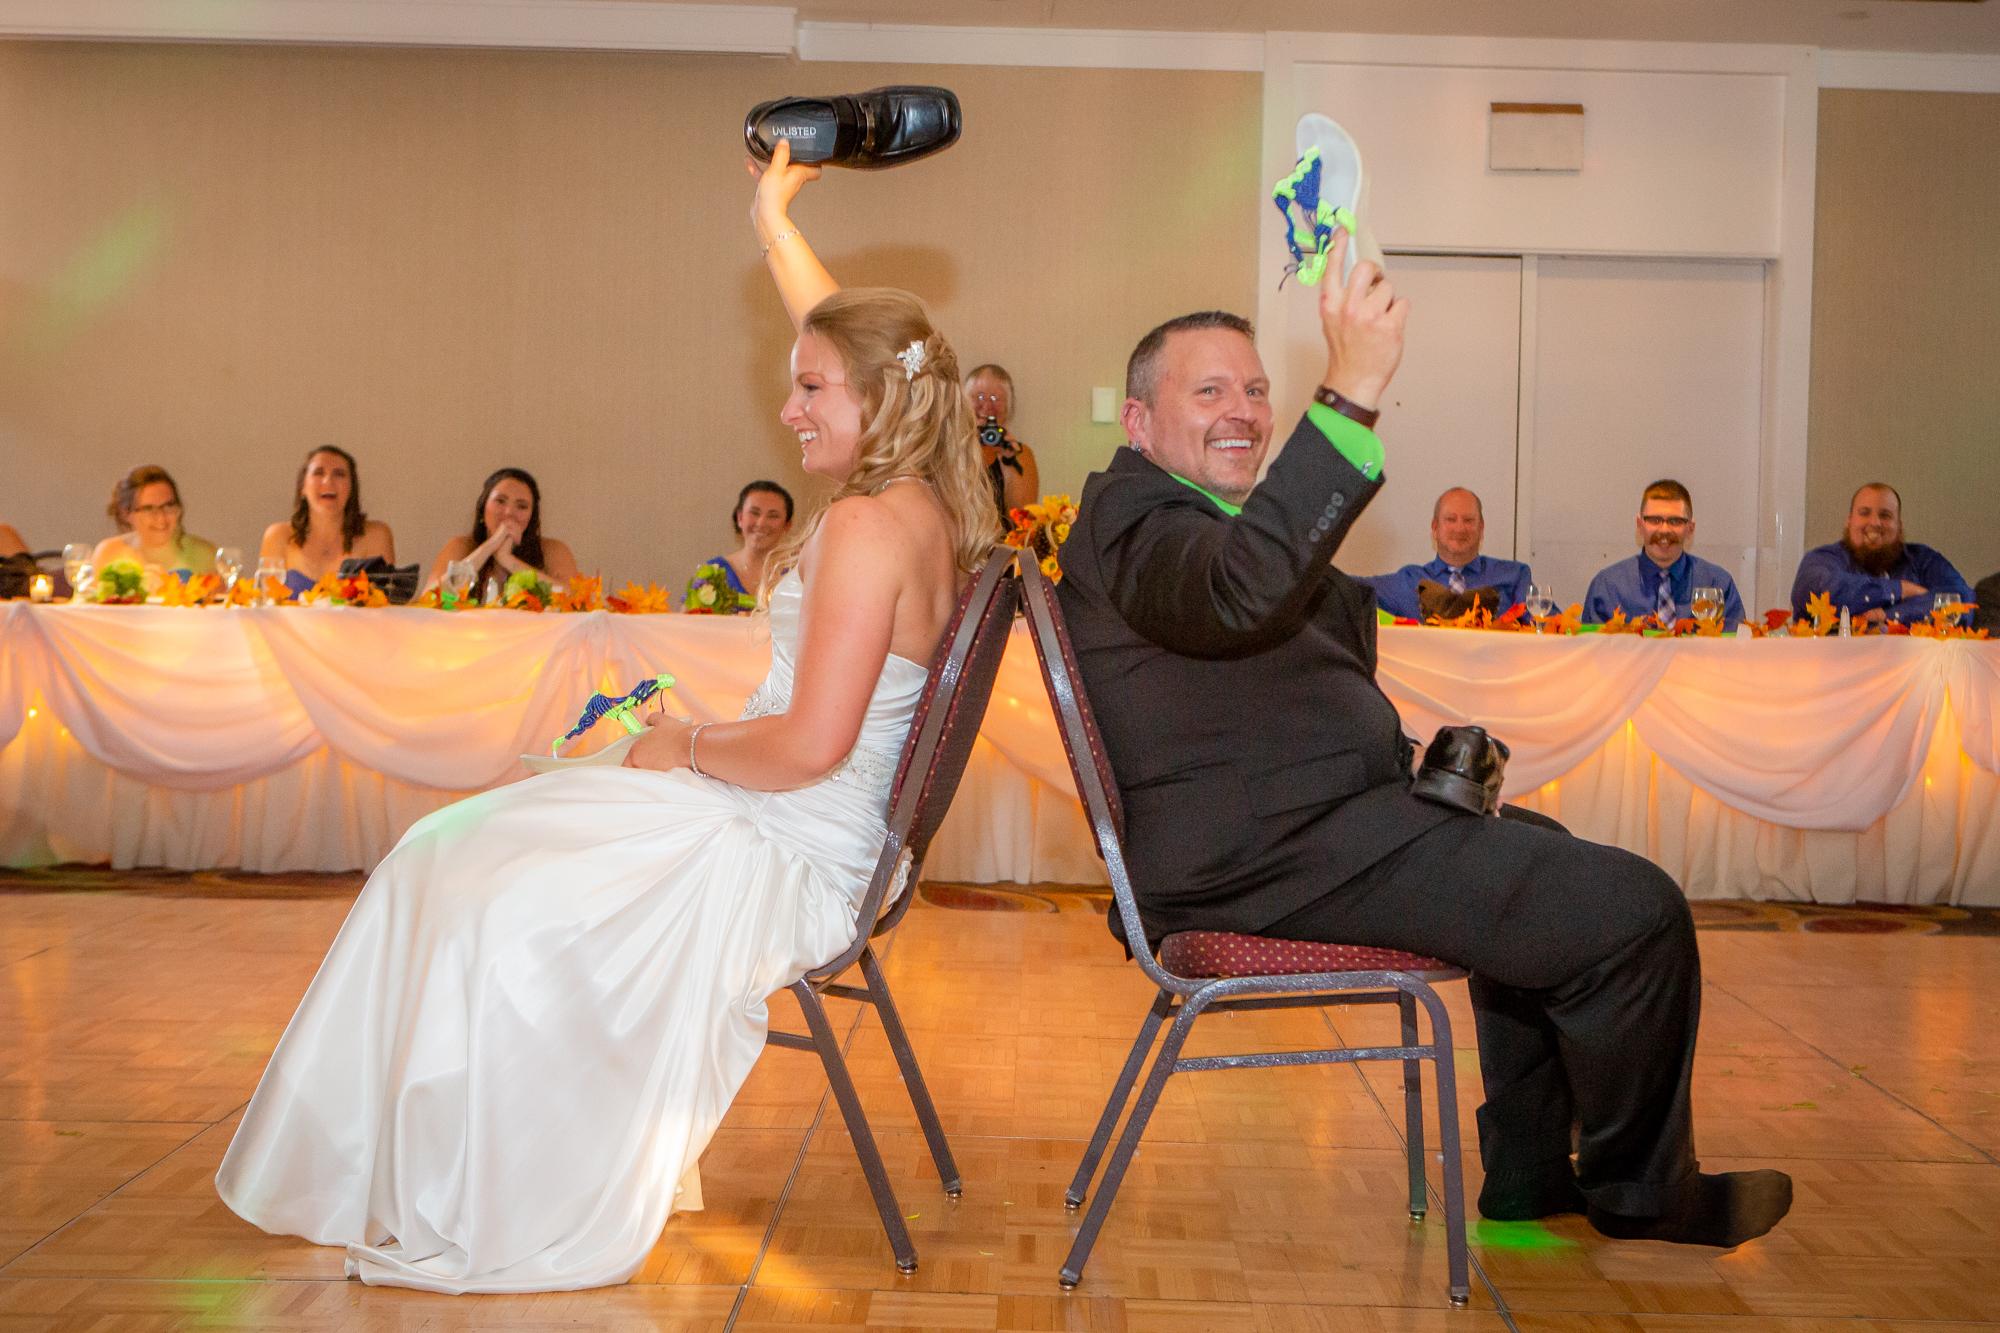 Raddison-Hotel-Corning-NY-Wedding-4540.jpg